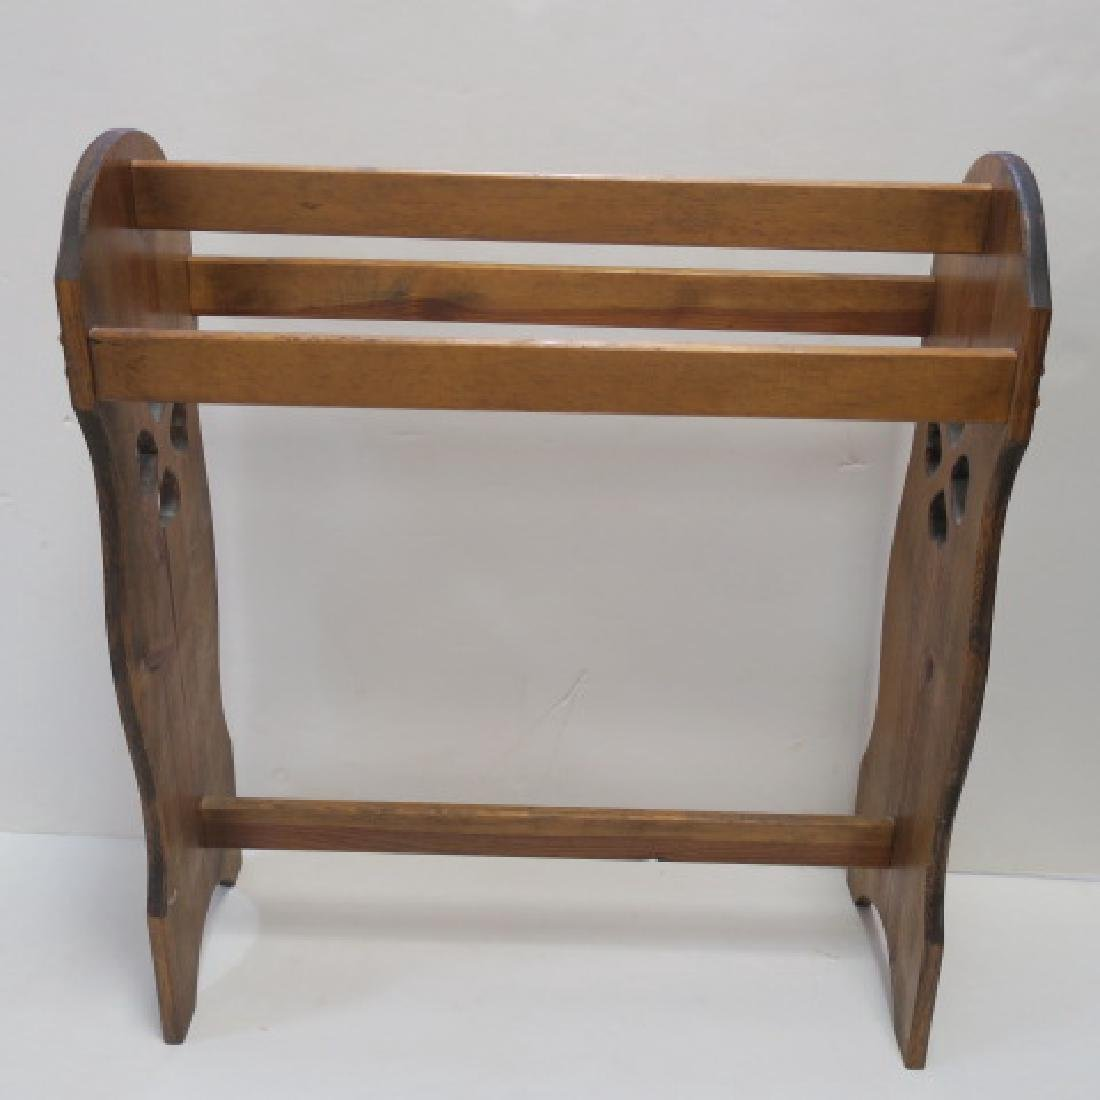 Pine Quilt Rack: - 2